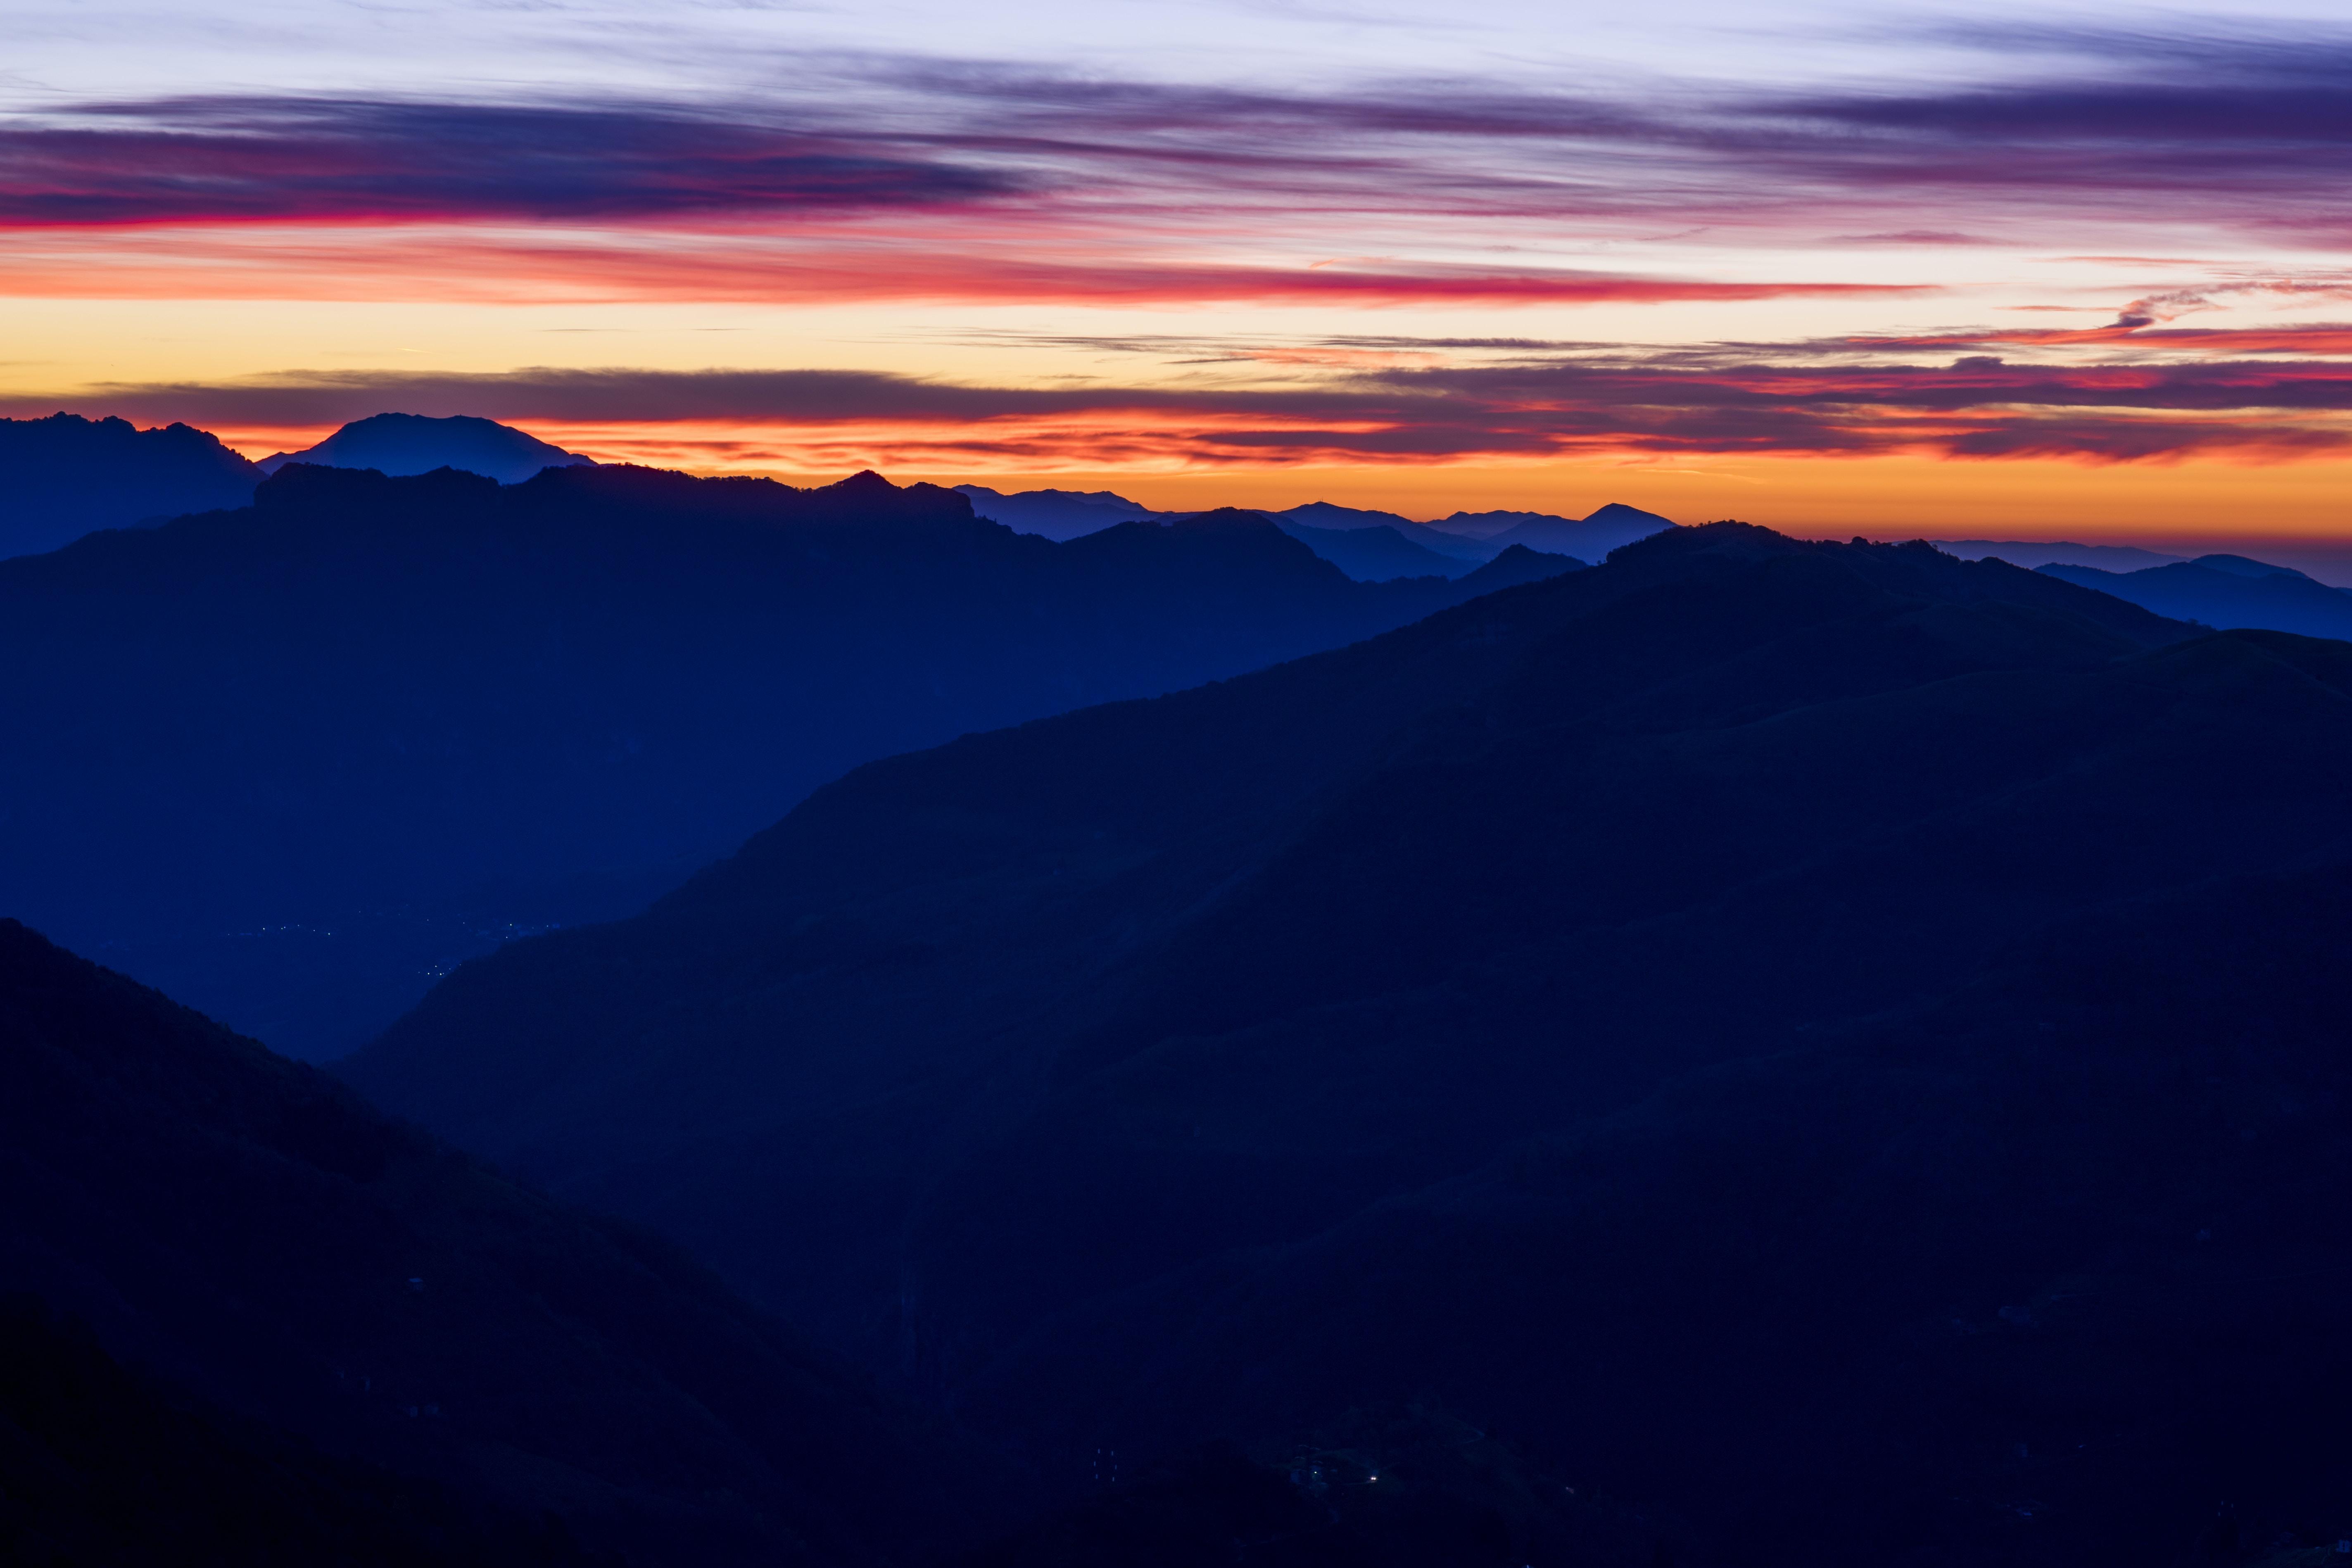 mountain ranges under orange sky during sunset